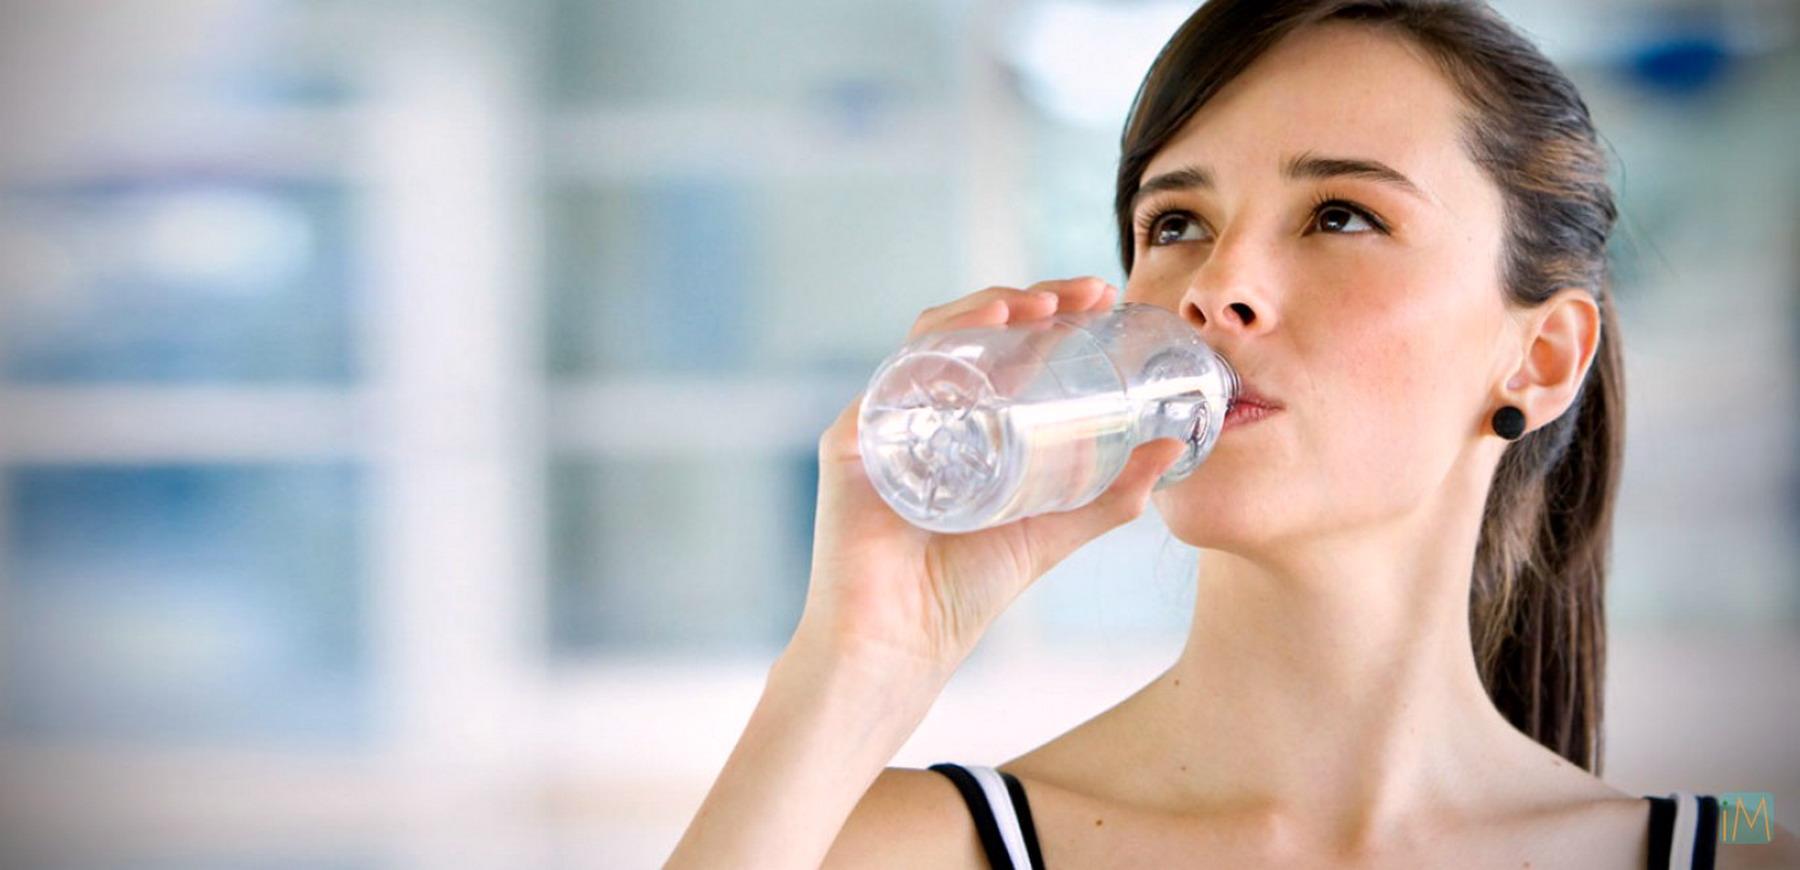 prostatite e bere acqua 2017